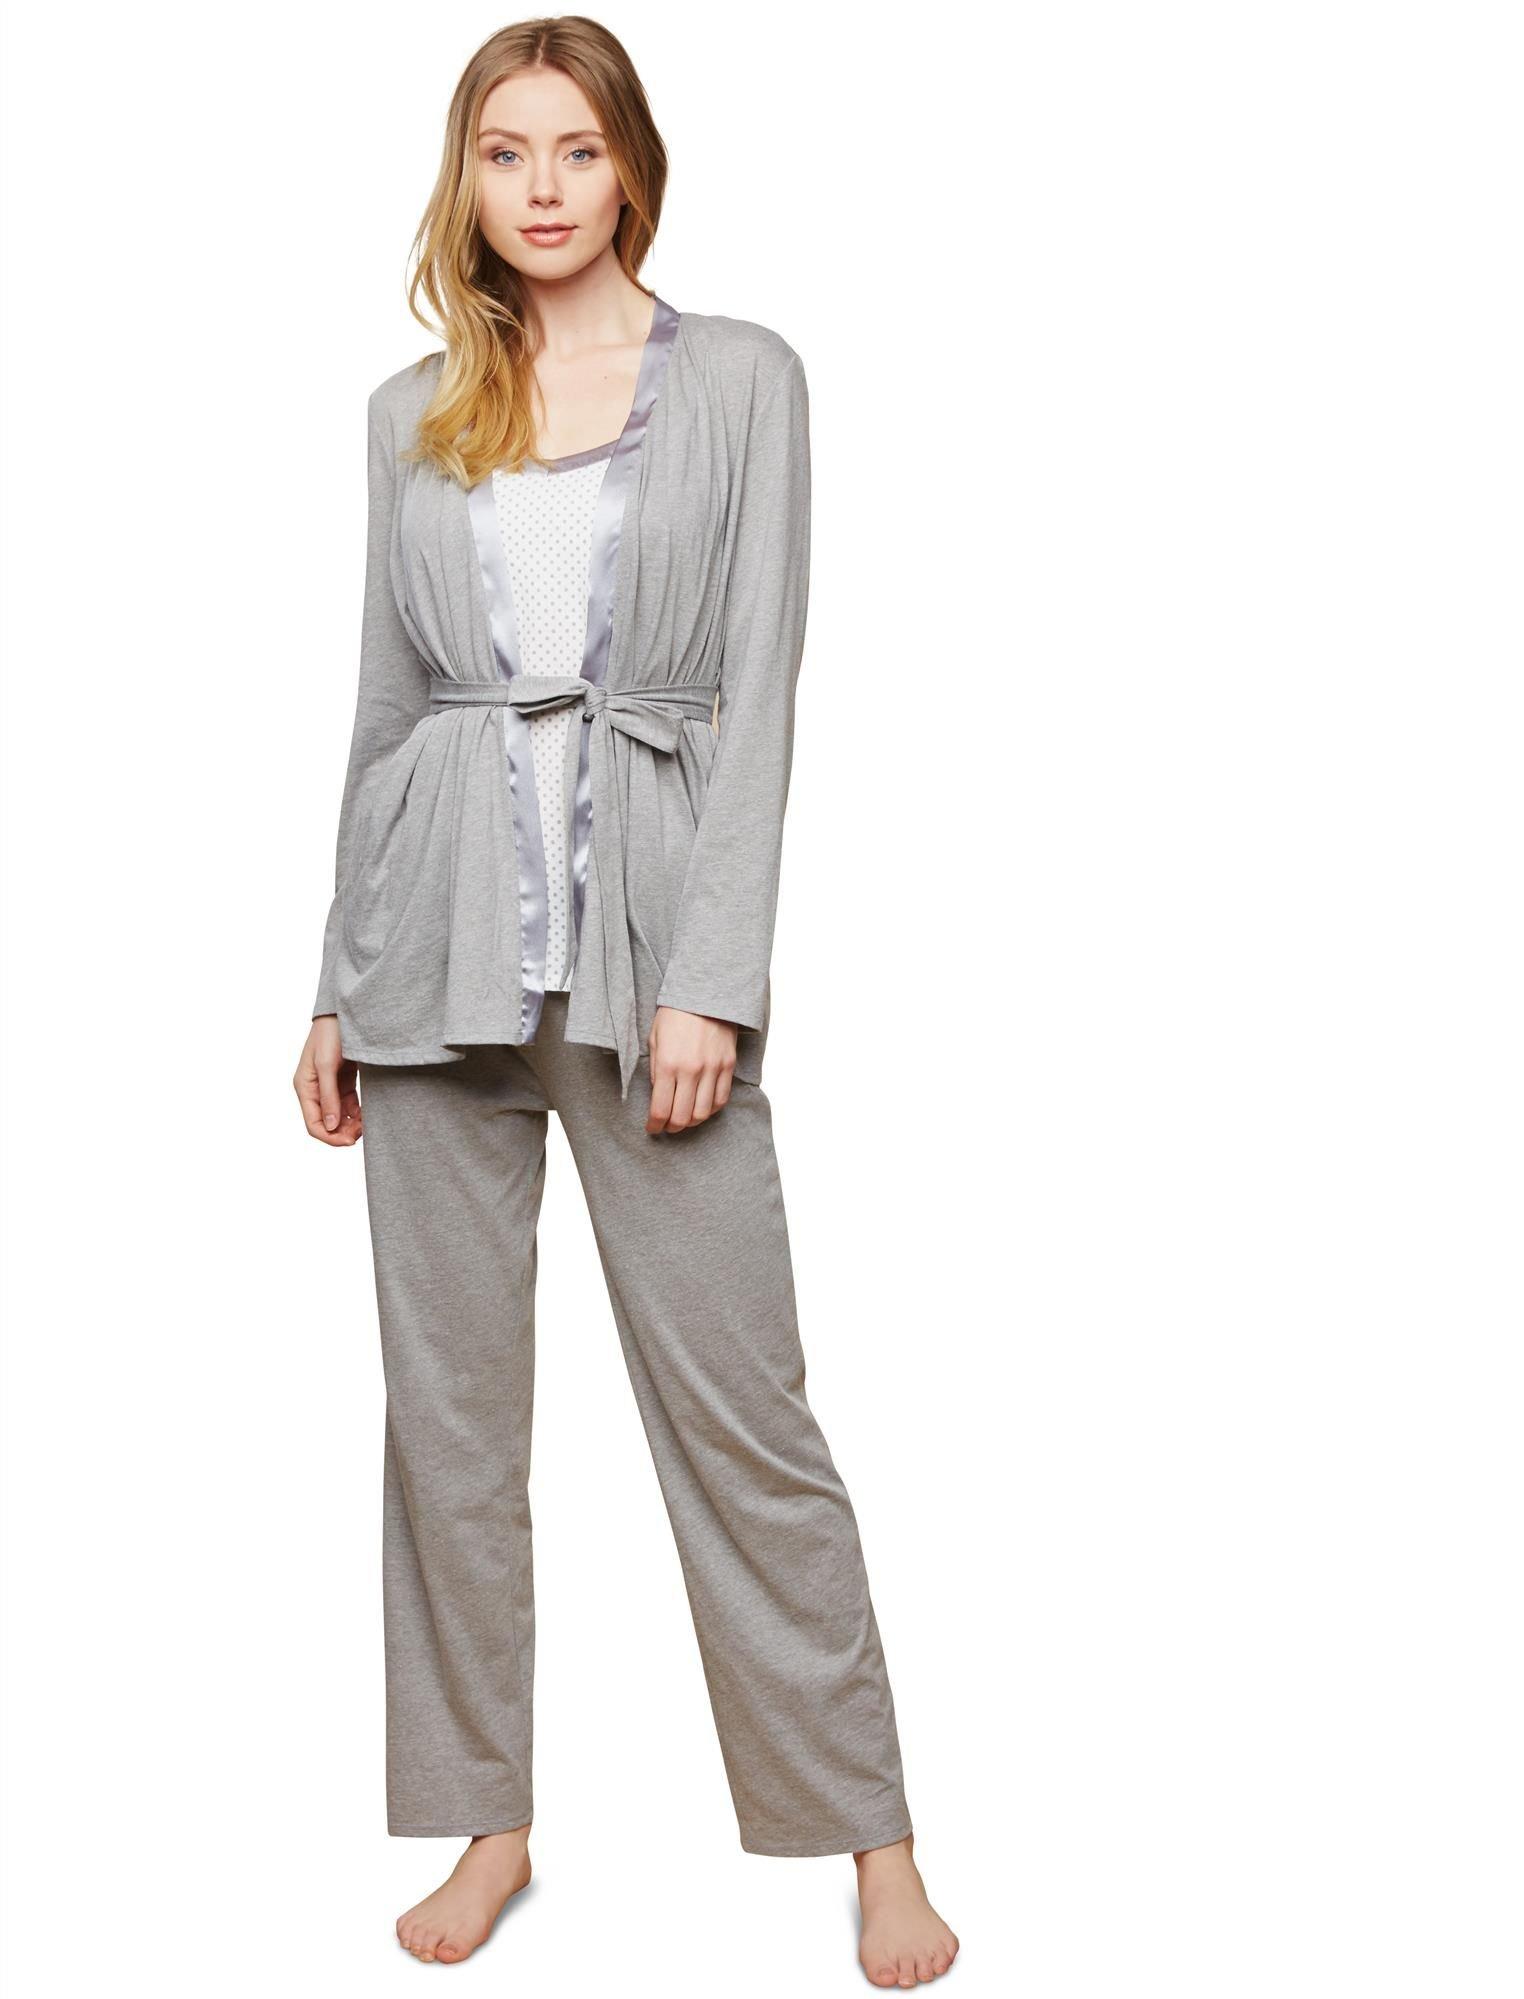 Motherhood Maternity Women's Maternity Satin Trim 3 Piece Pajama Set with Nursing Function, Grey/White Dot, Small